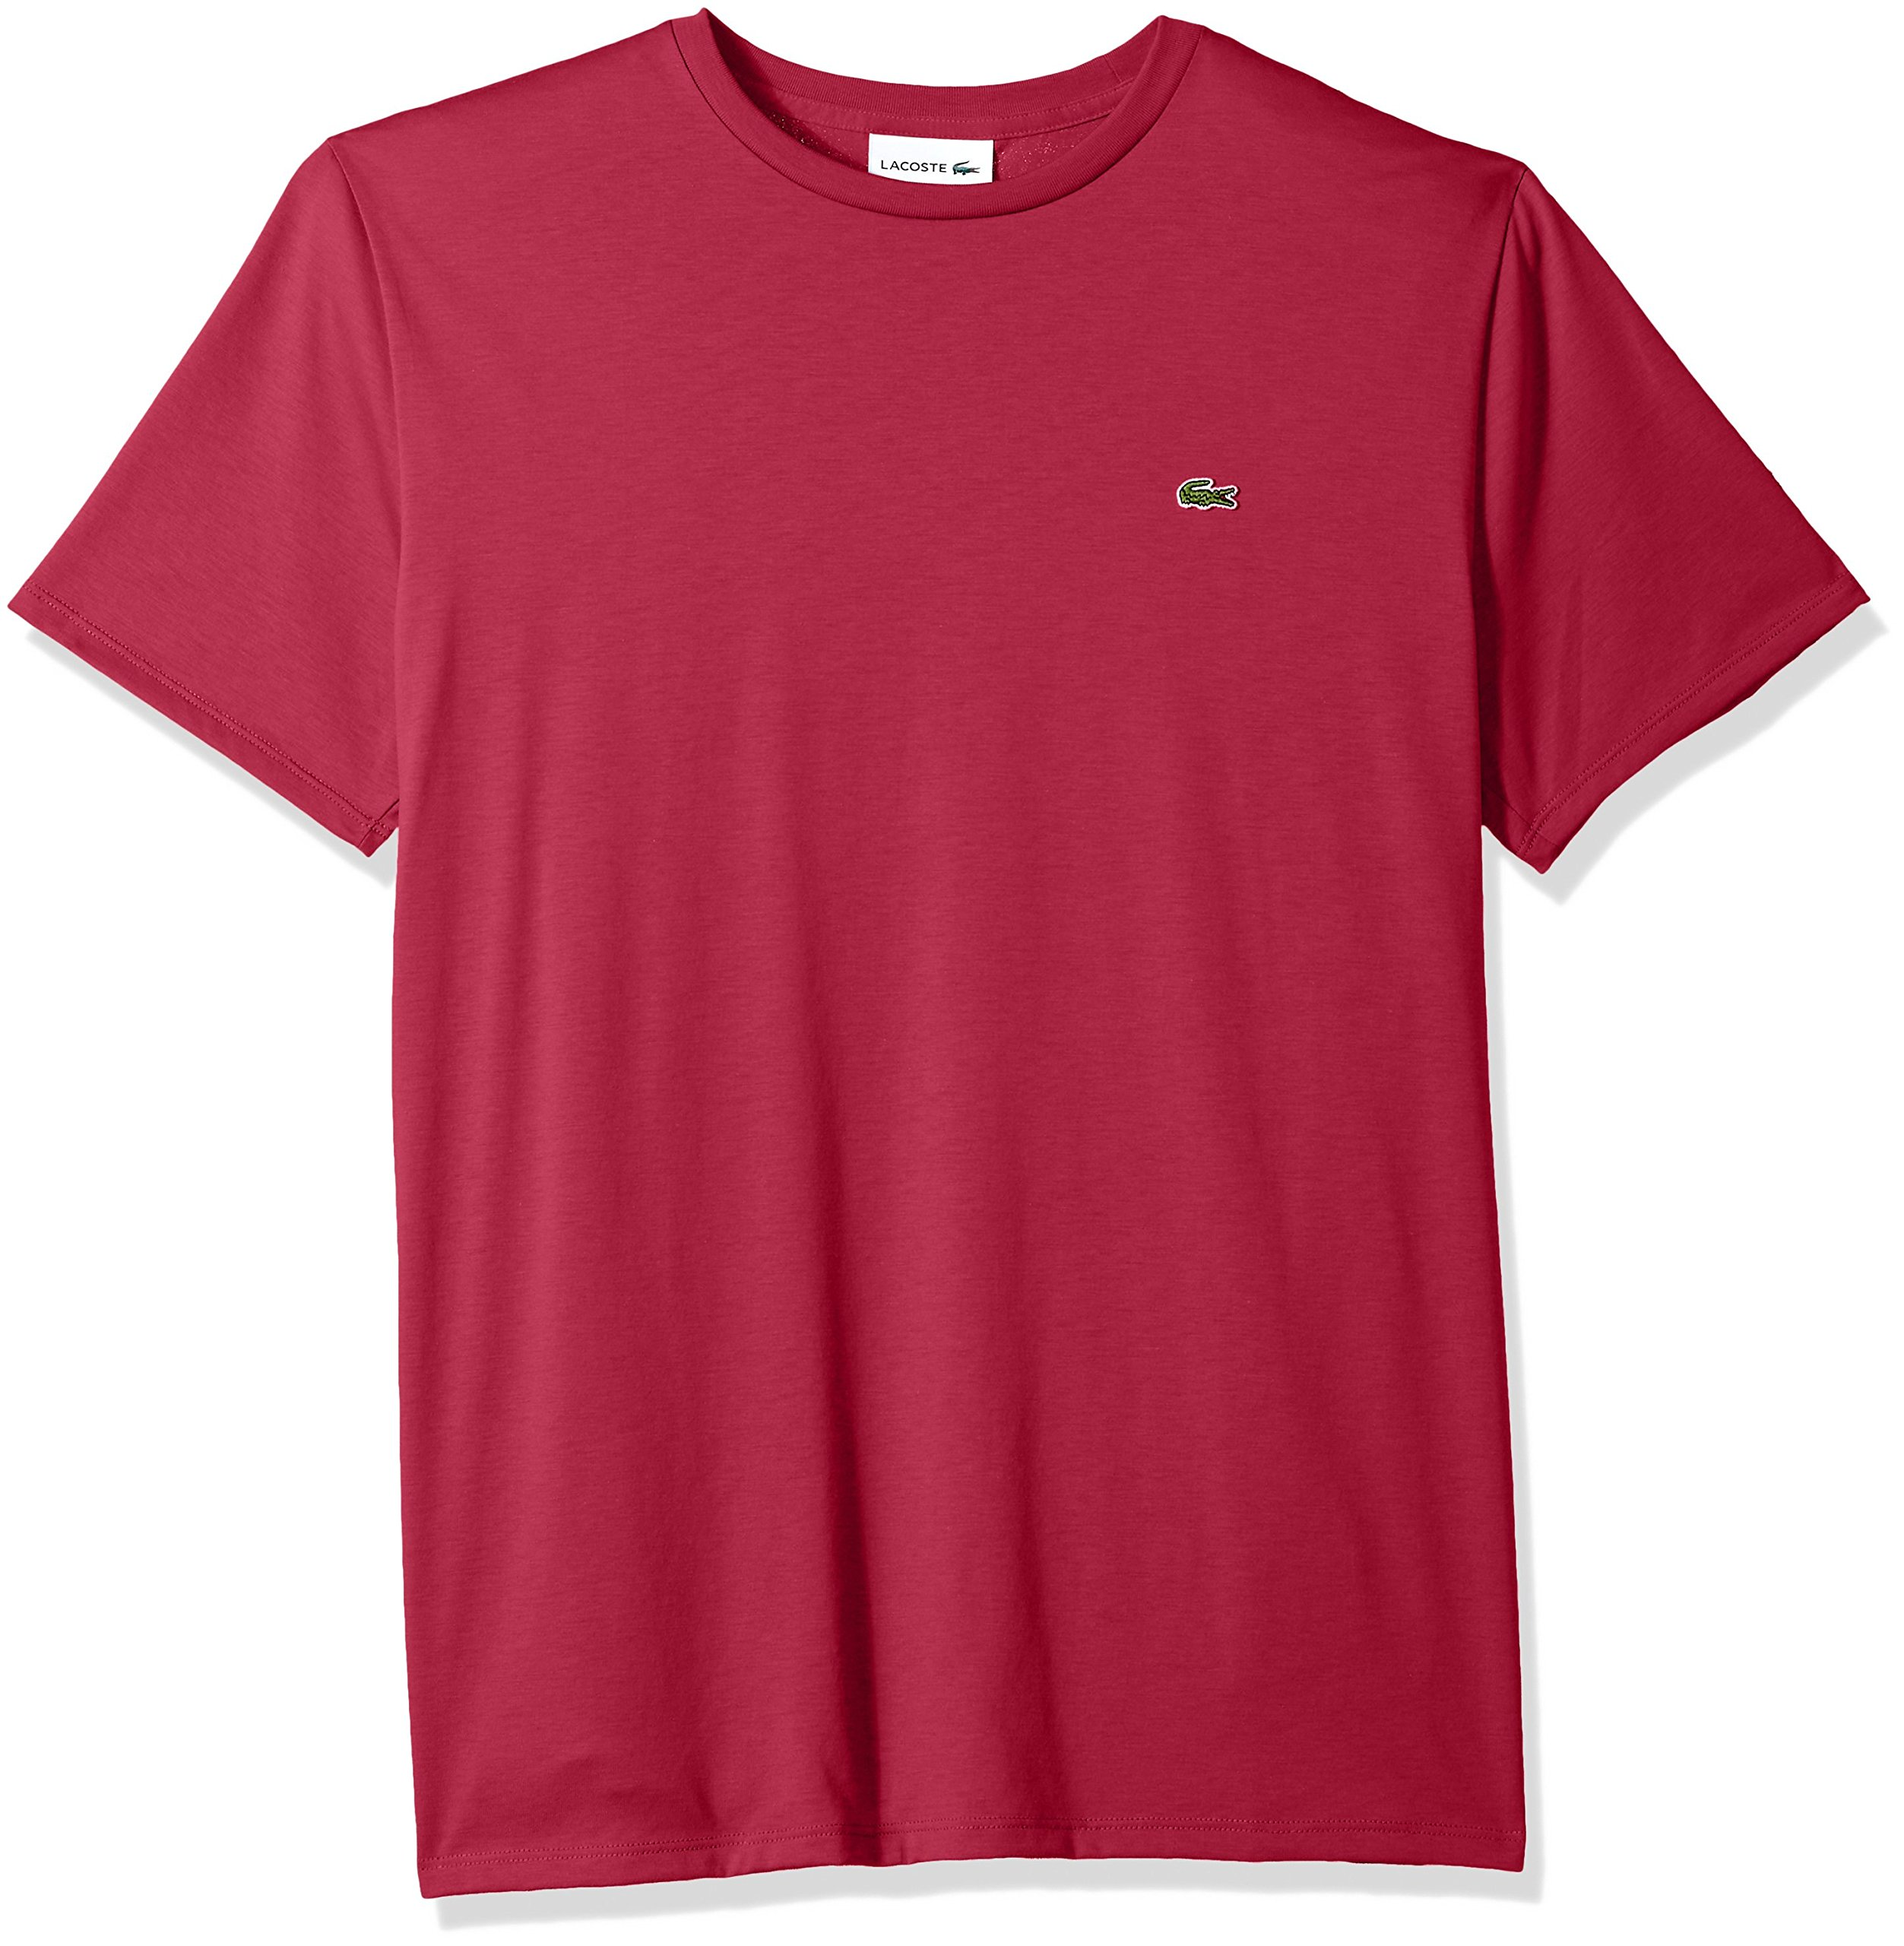 Lacoste Men's Short Sleeve Crew Neck Pima Cotton Jersey T-Shirt, Persian red, XX-Large